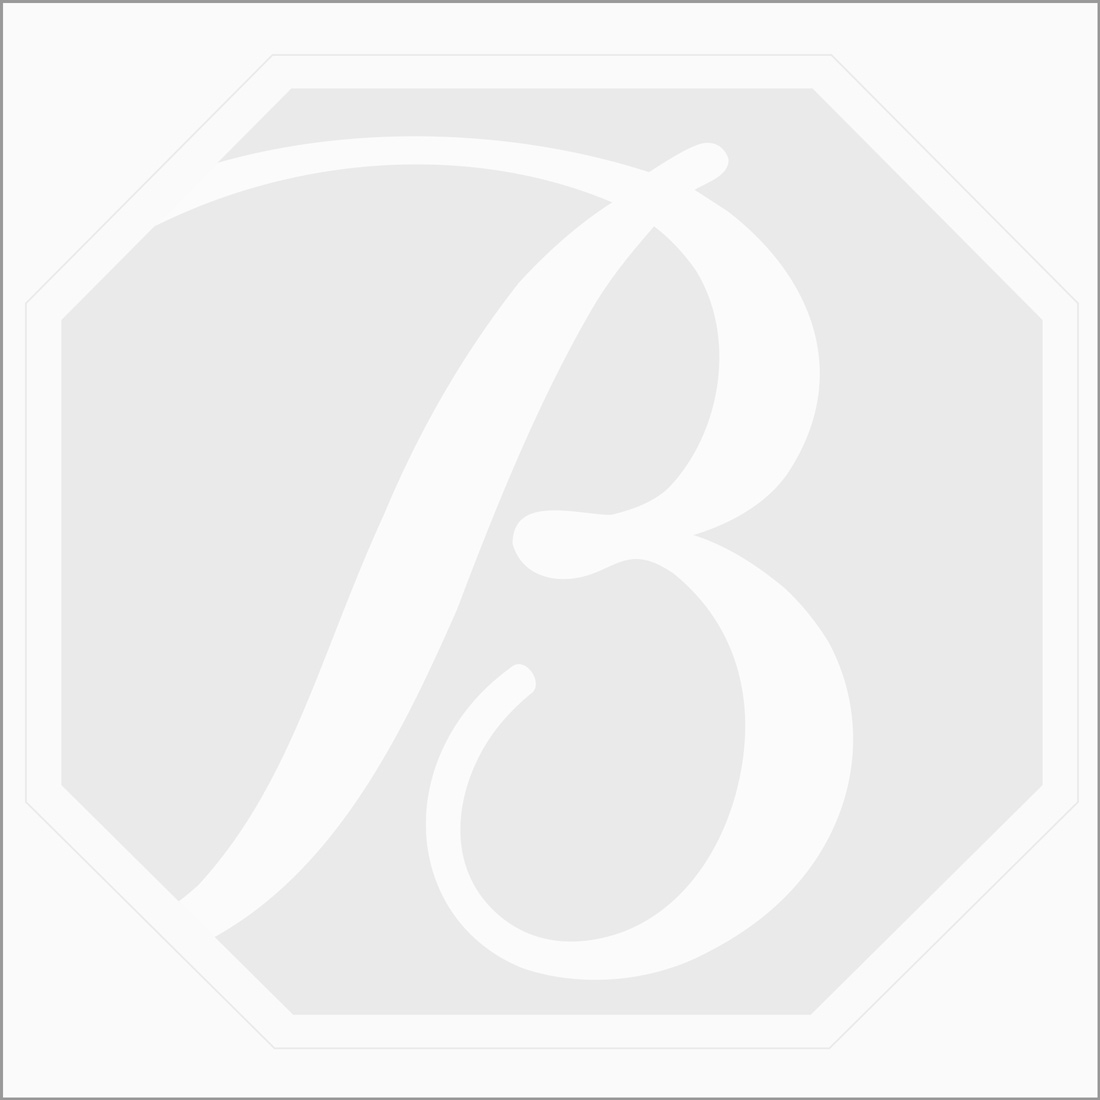 Black Diamond Cubes - 1 Line - 45.54 carats (BDiaCu1003)